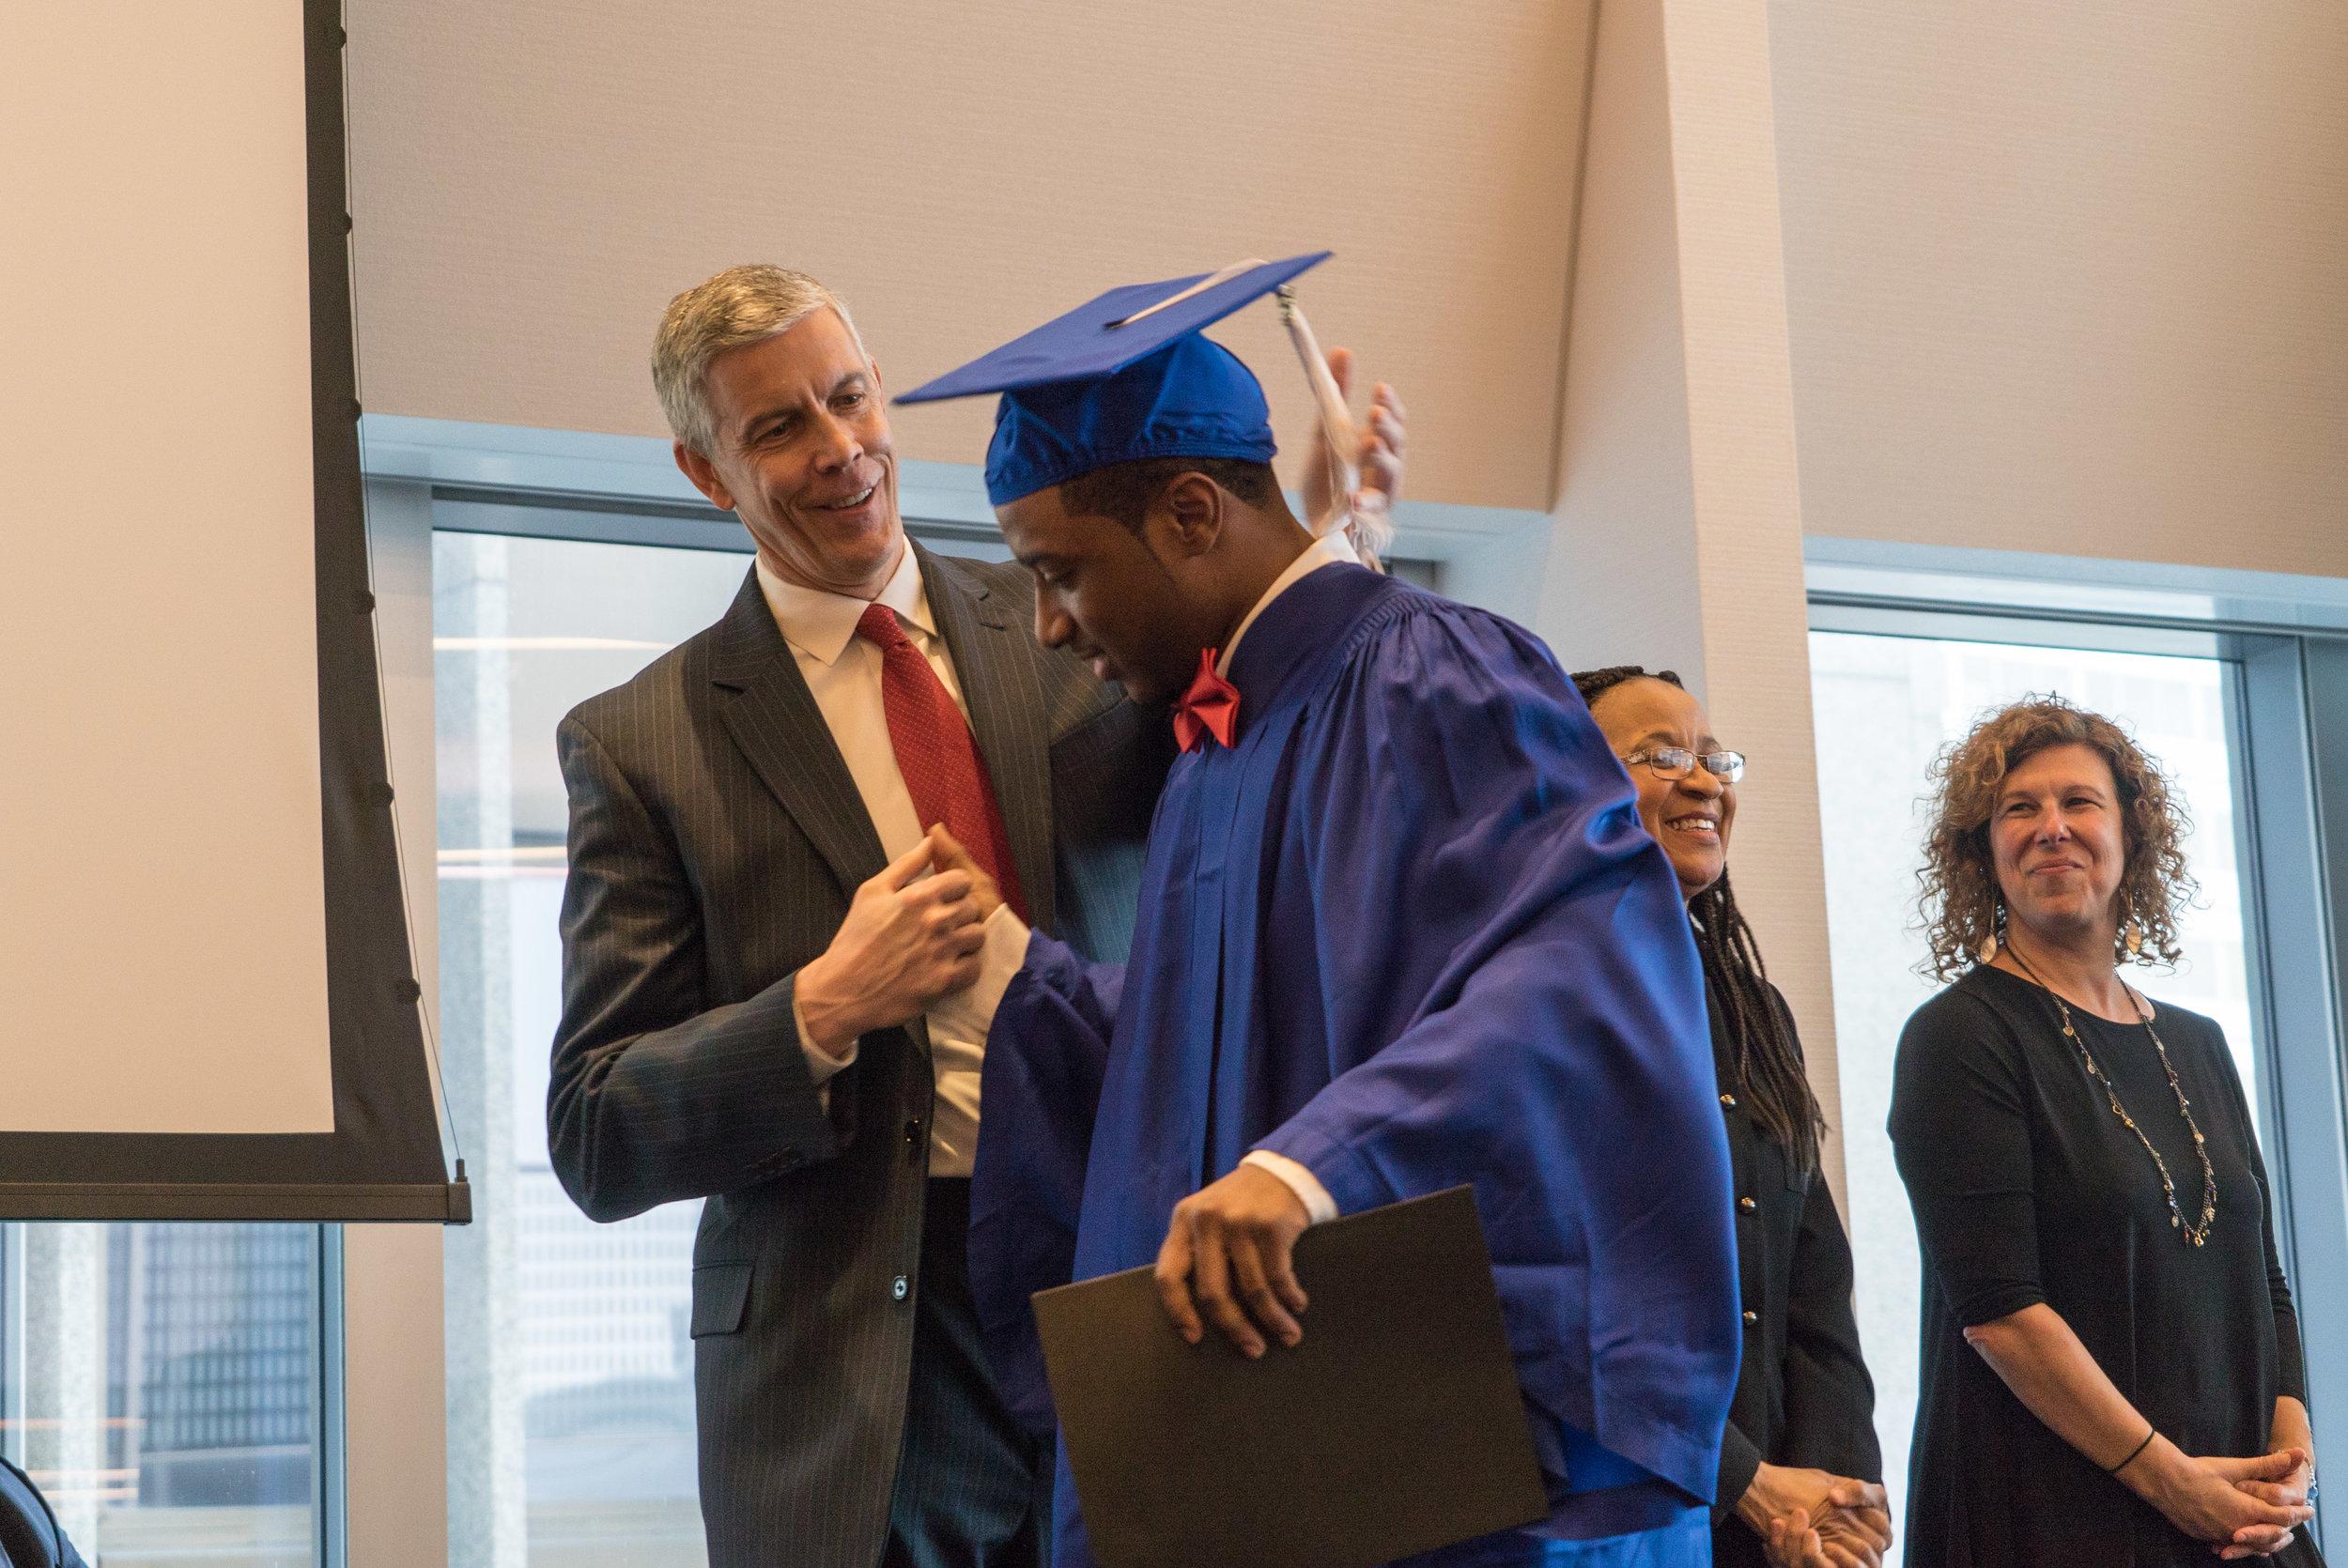 CRED_Graduation_Chicago_04062018-2.jpg